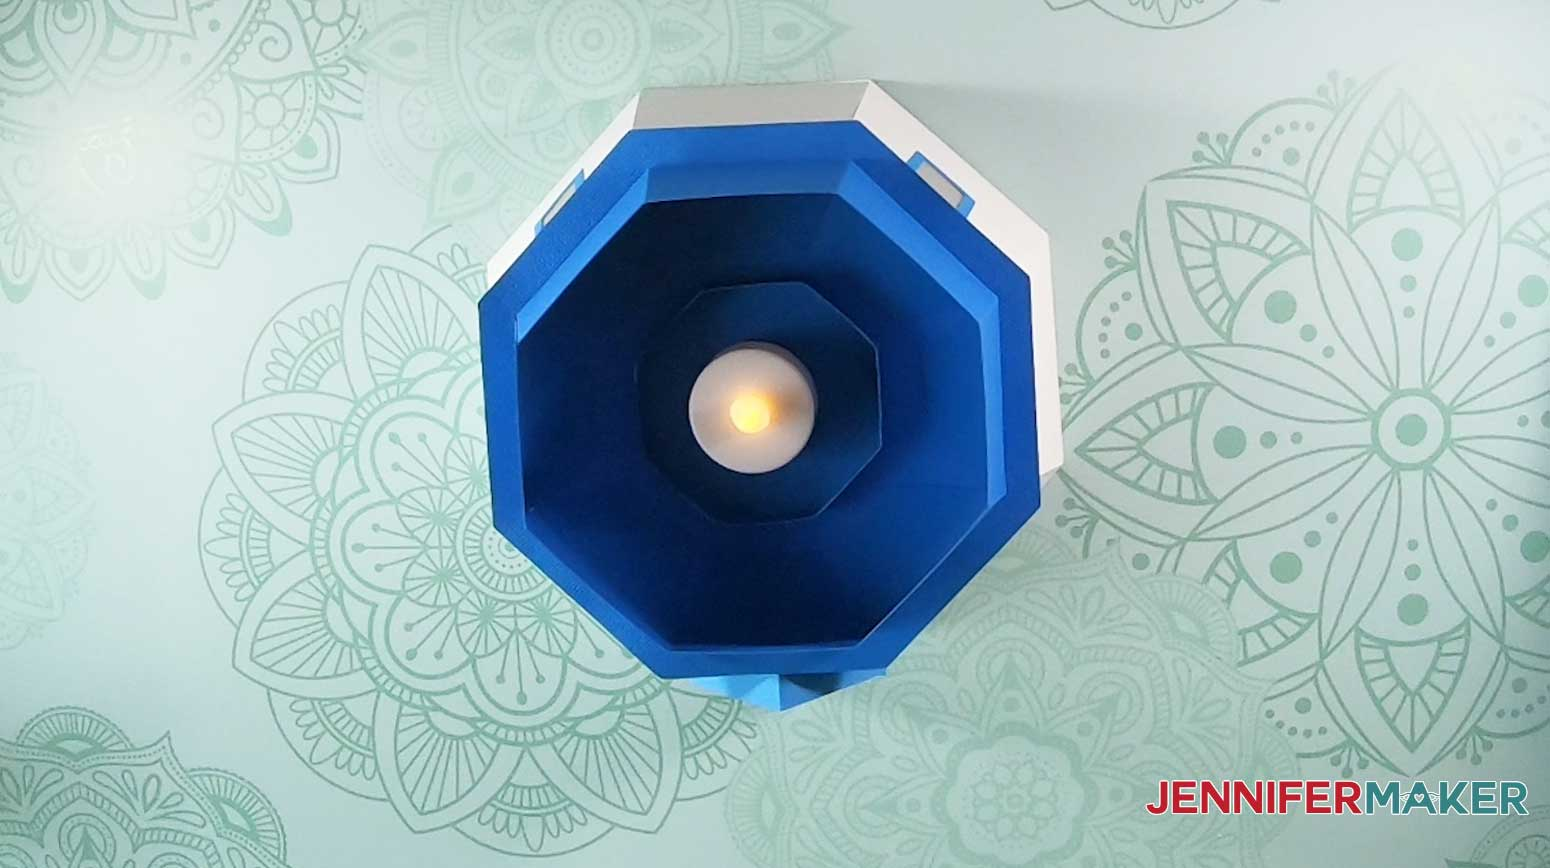 finished base of jennifermaker paper lighthouse luminary